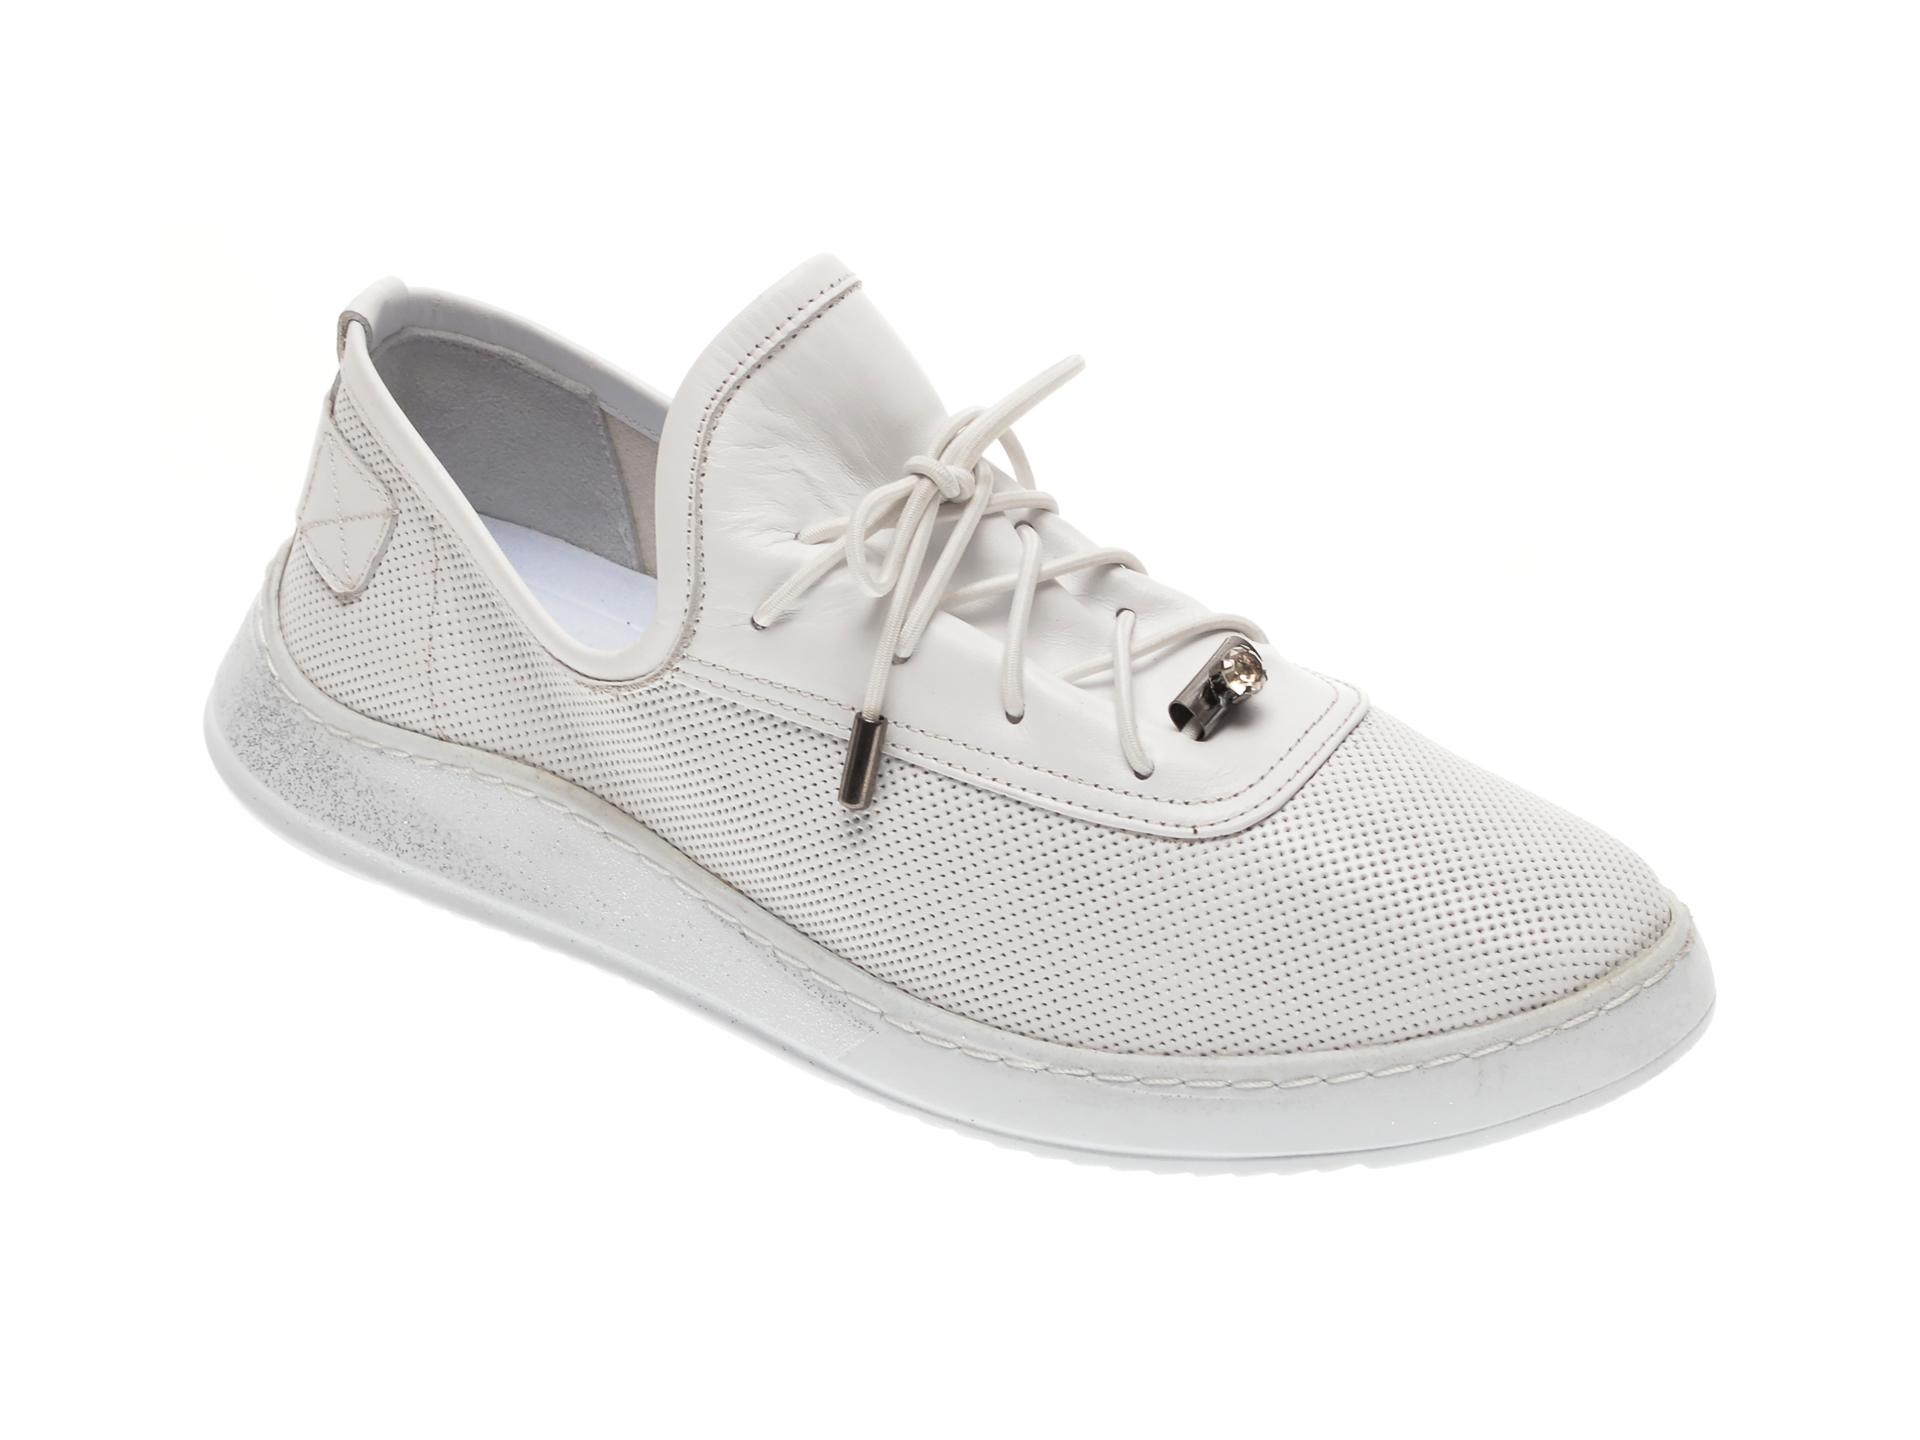 Pantofi BABOOS albi, 0908, din piele naturala imagine